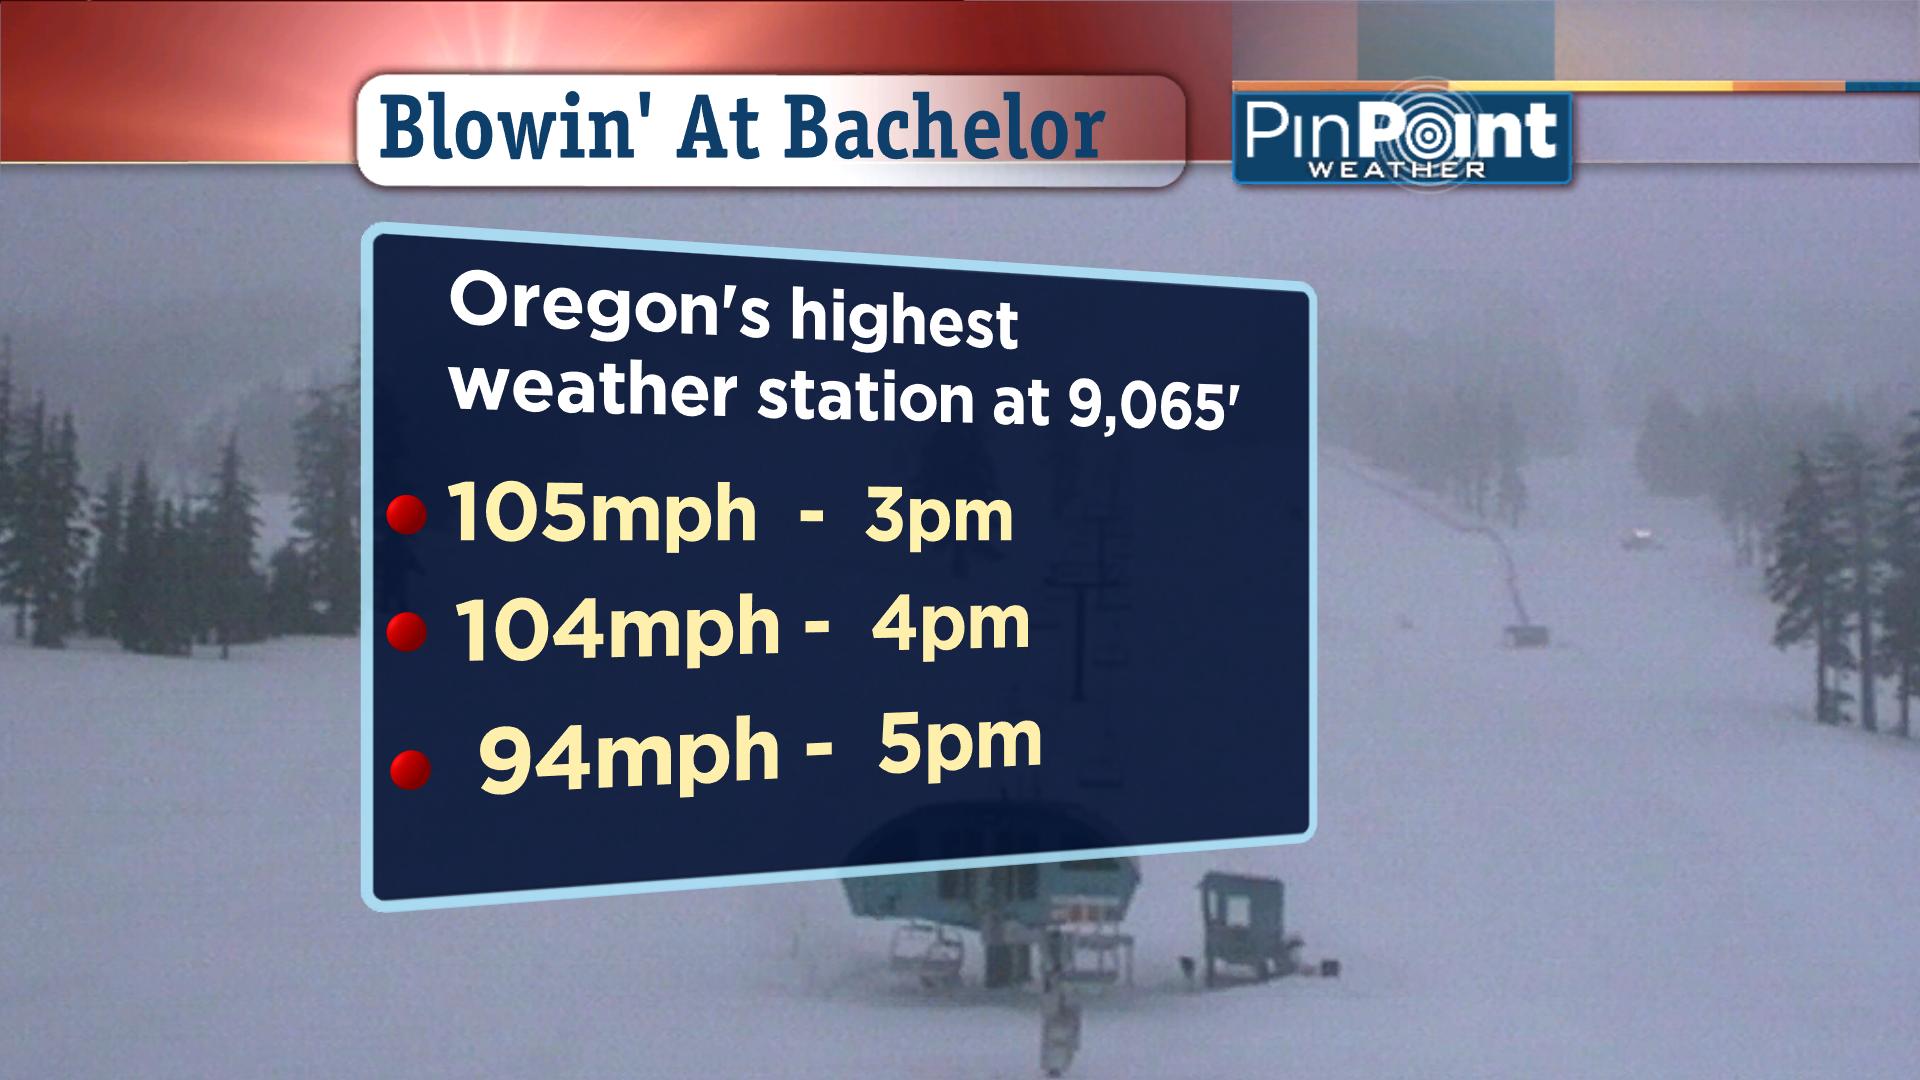 Hurricane Force Wind Gusts Slam Mt. Bachelor, Oregon and top 100mph